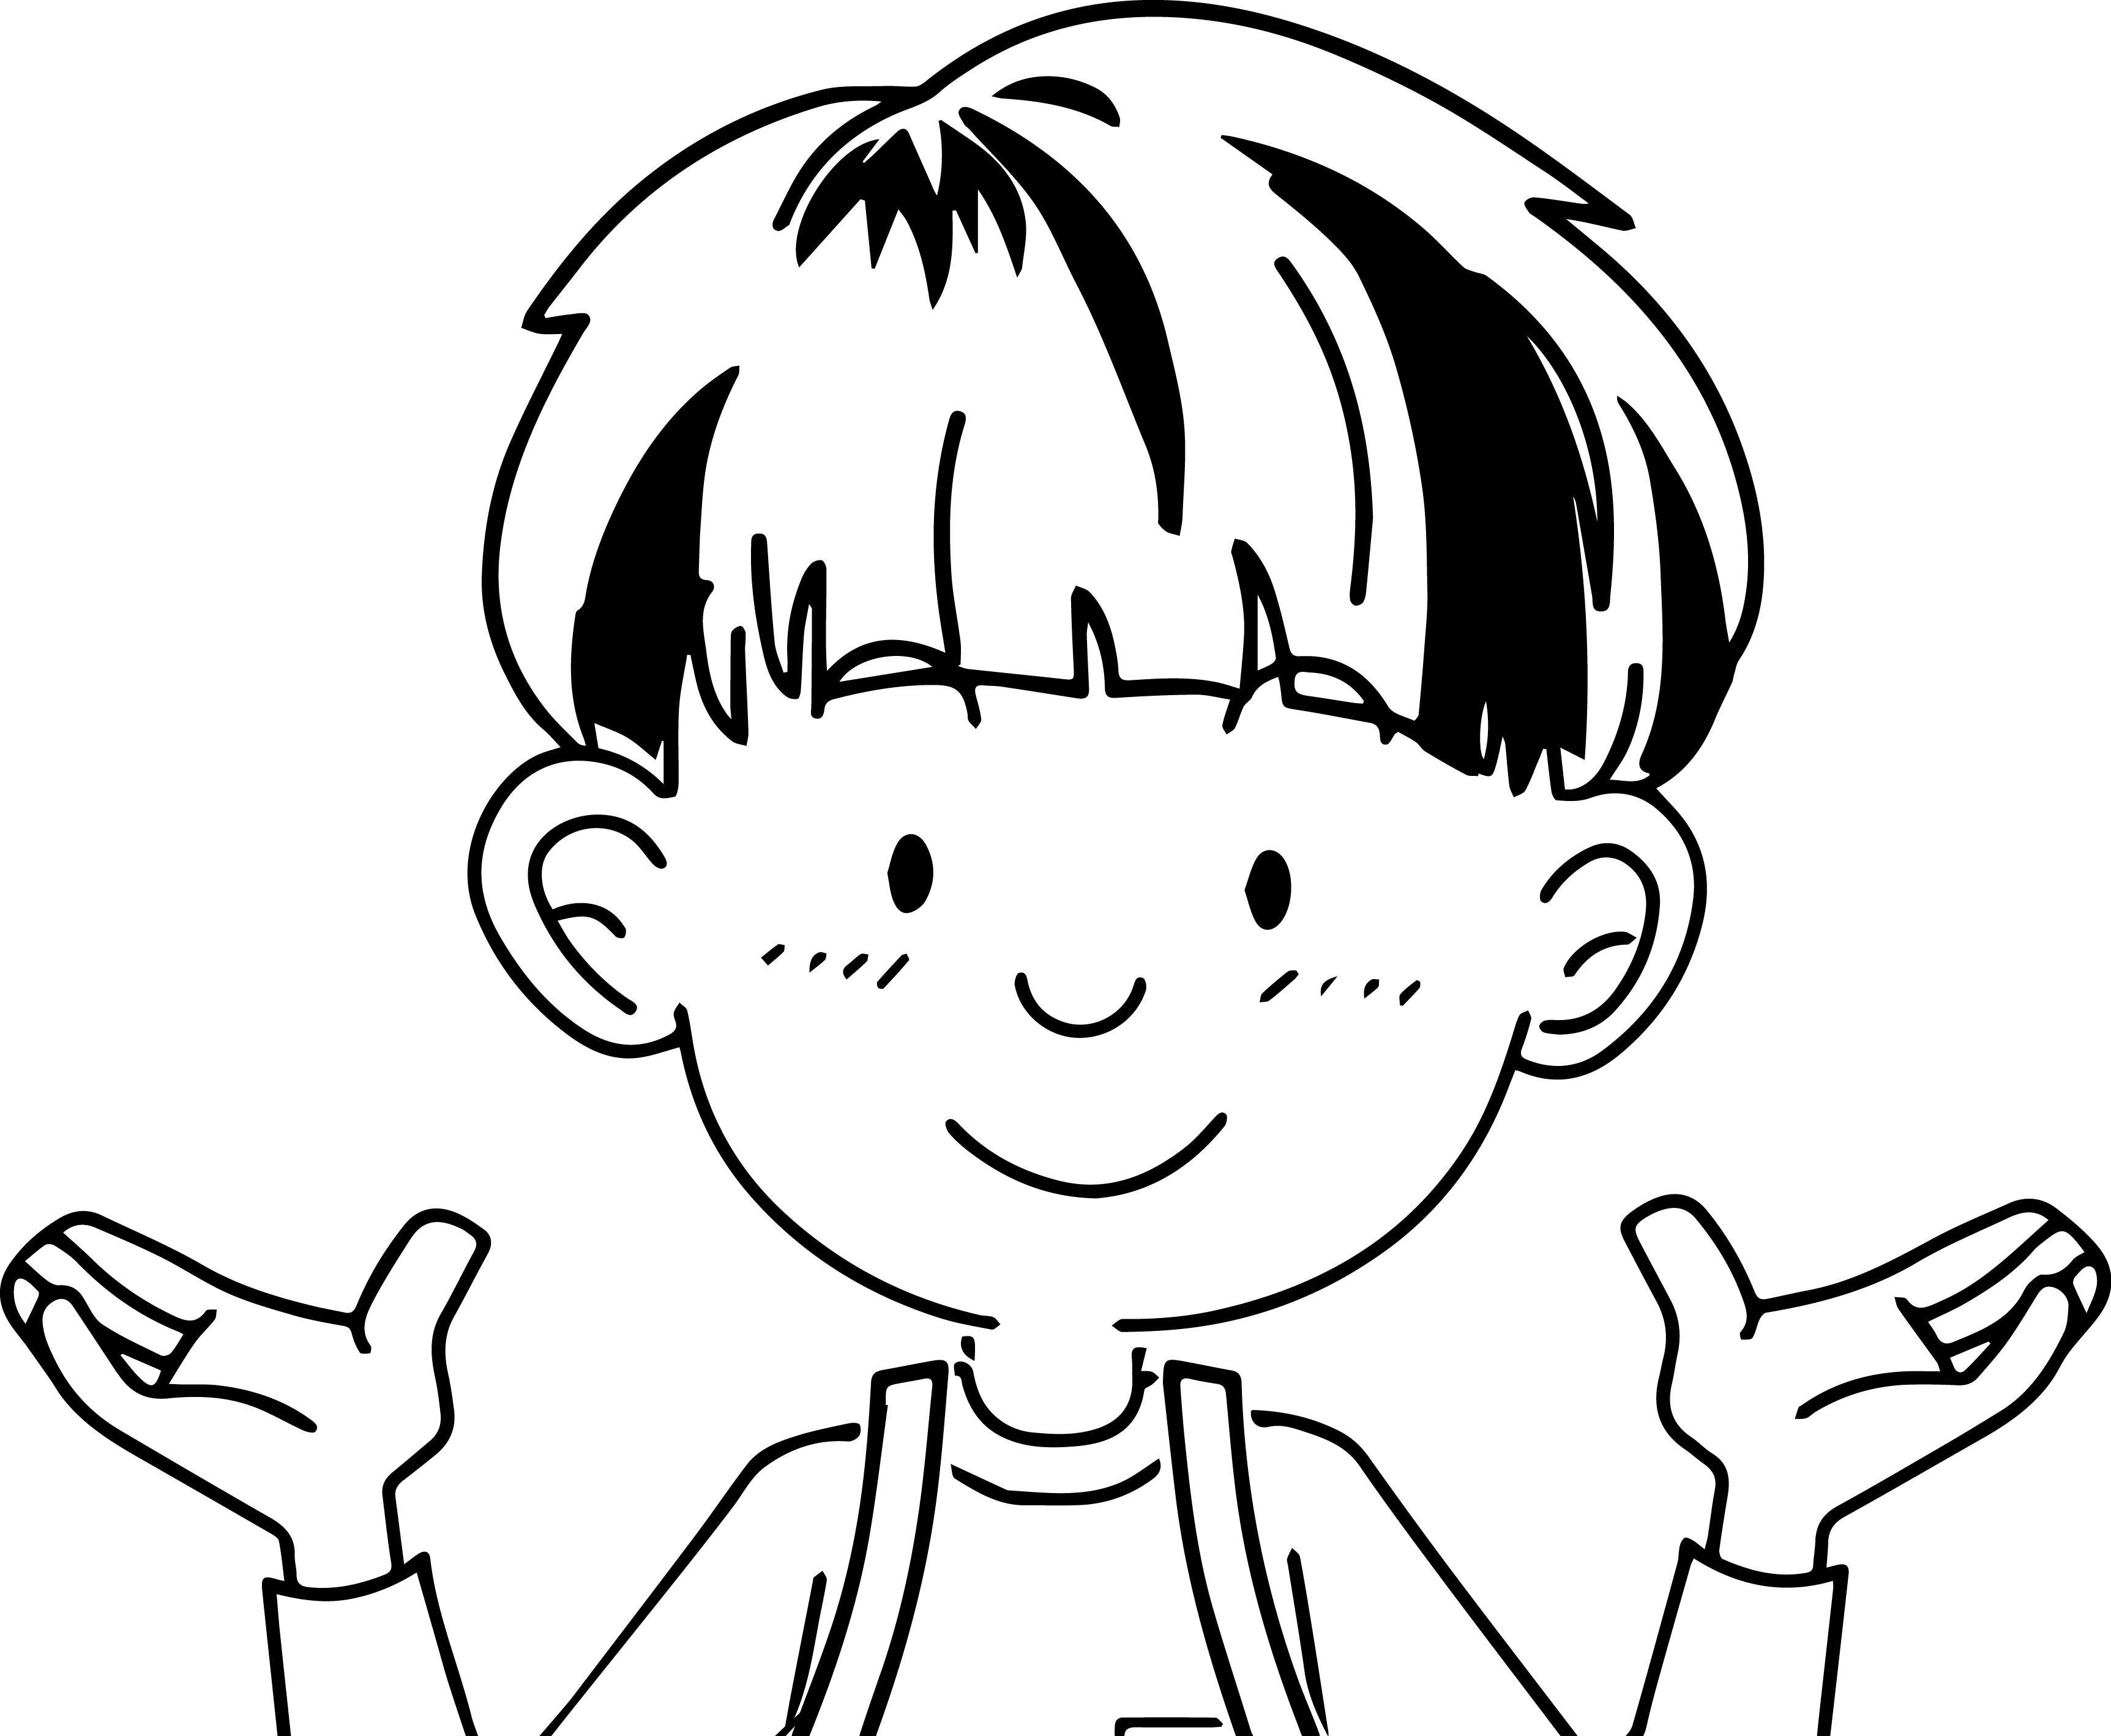 Speaking Cartoon Kids Coloring Page 29